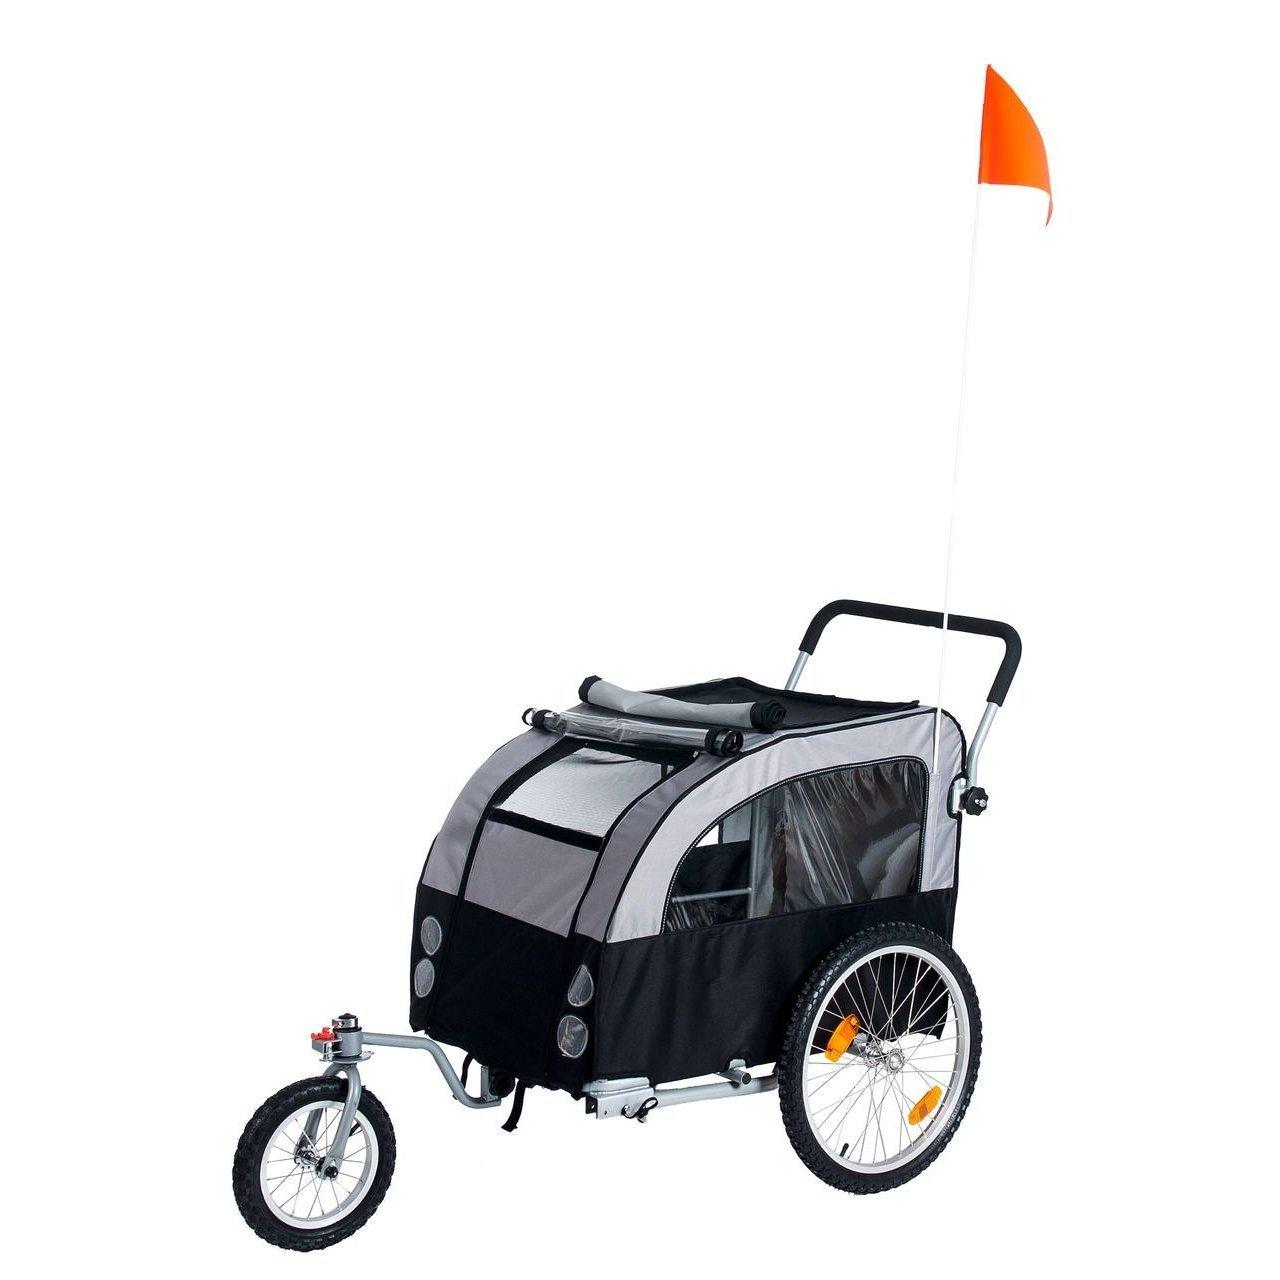 Karlie Doggy Liner Berlin Teflon® Fahrradanhänger für Hunde, L: 148 cm B: 81 cm H: 87 cm grau-schwarz